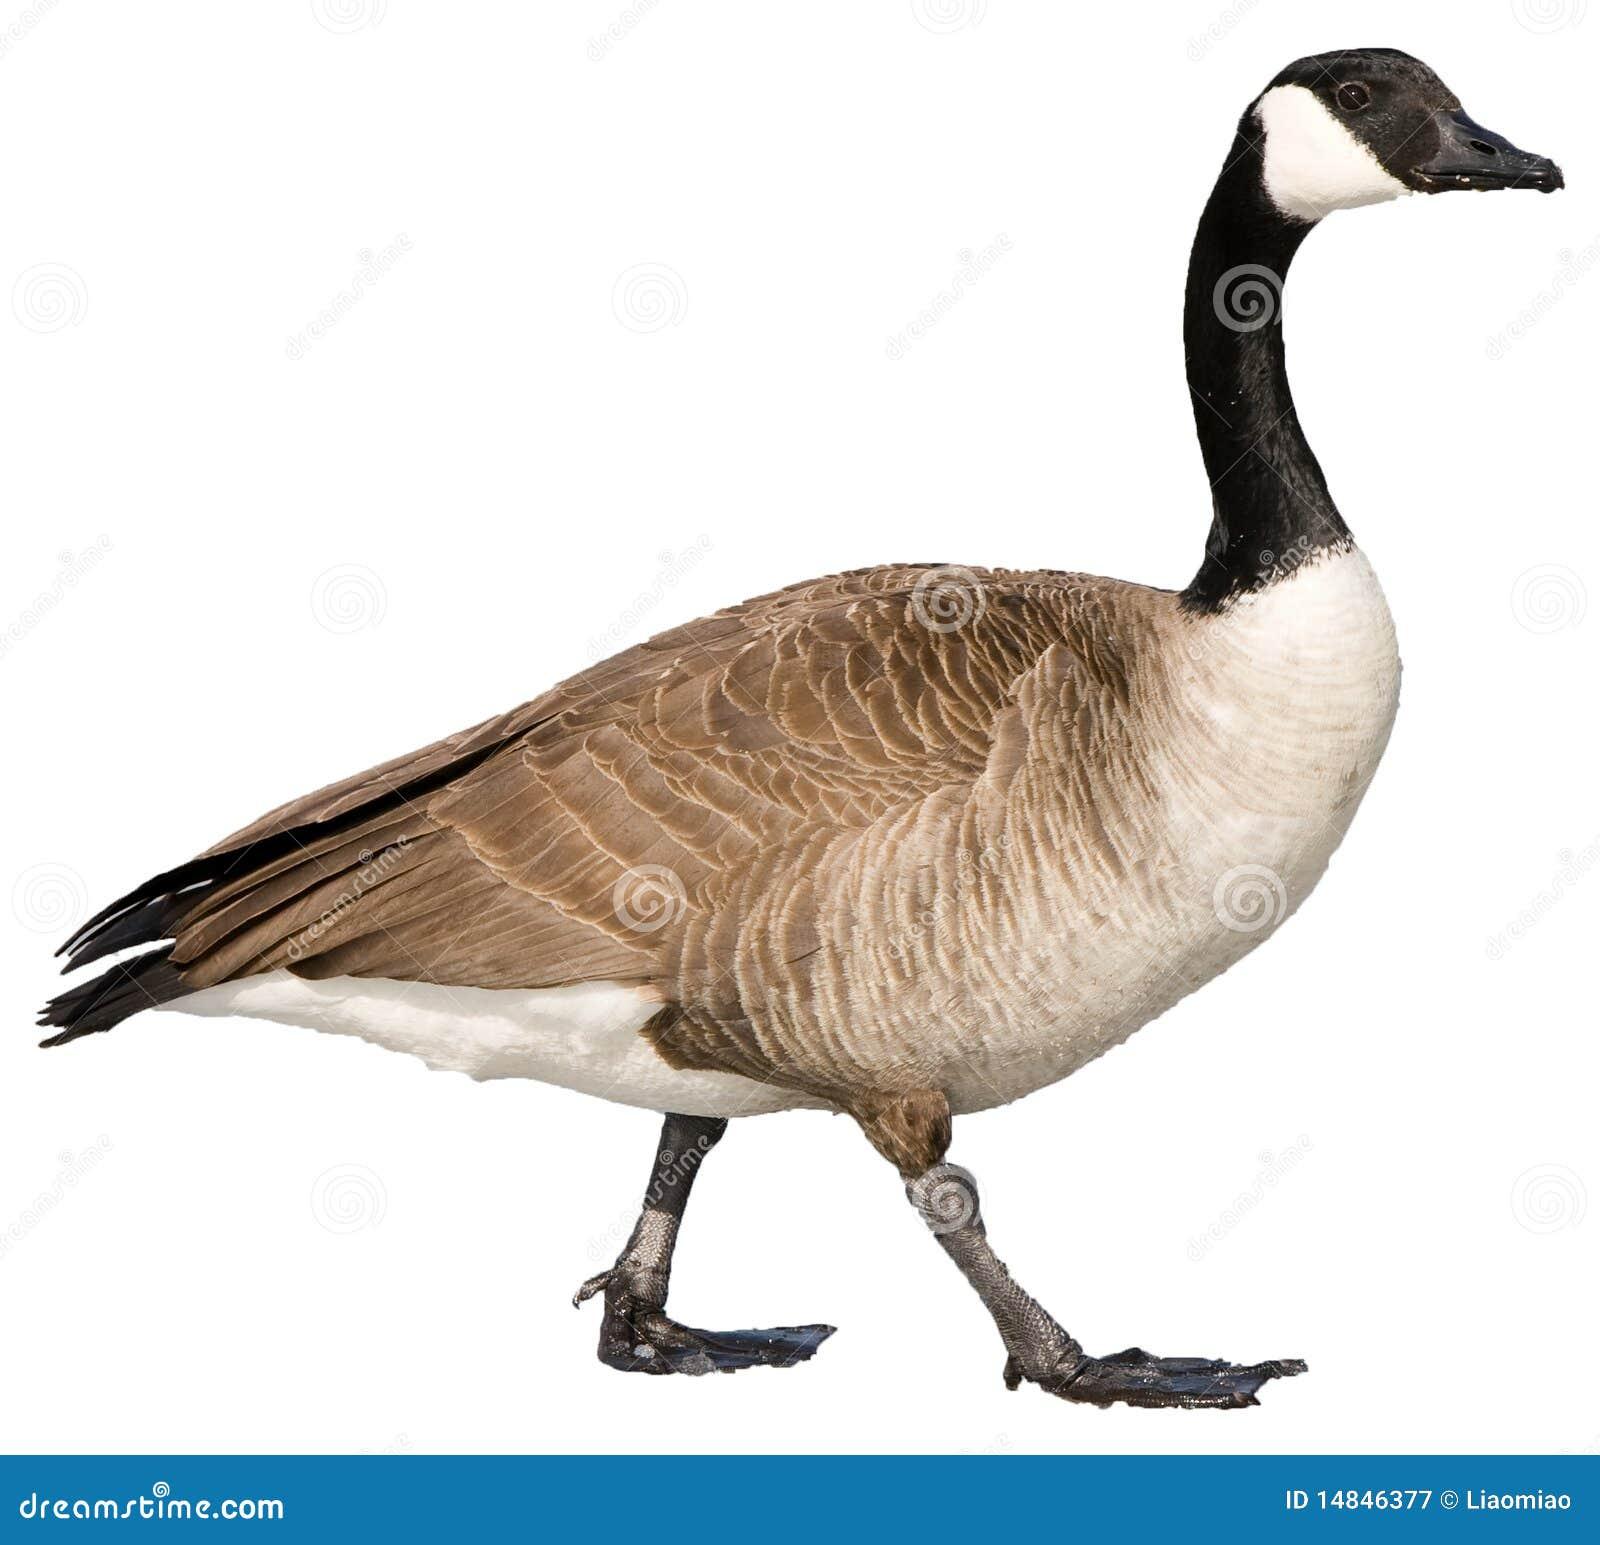 Download Canadian Goose stock image. Image of ducks, animal, fowl - 14846377